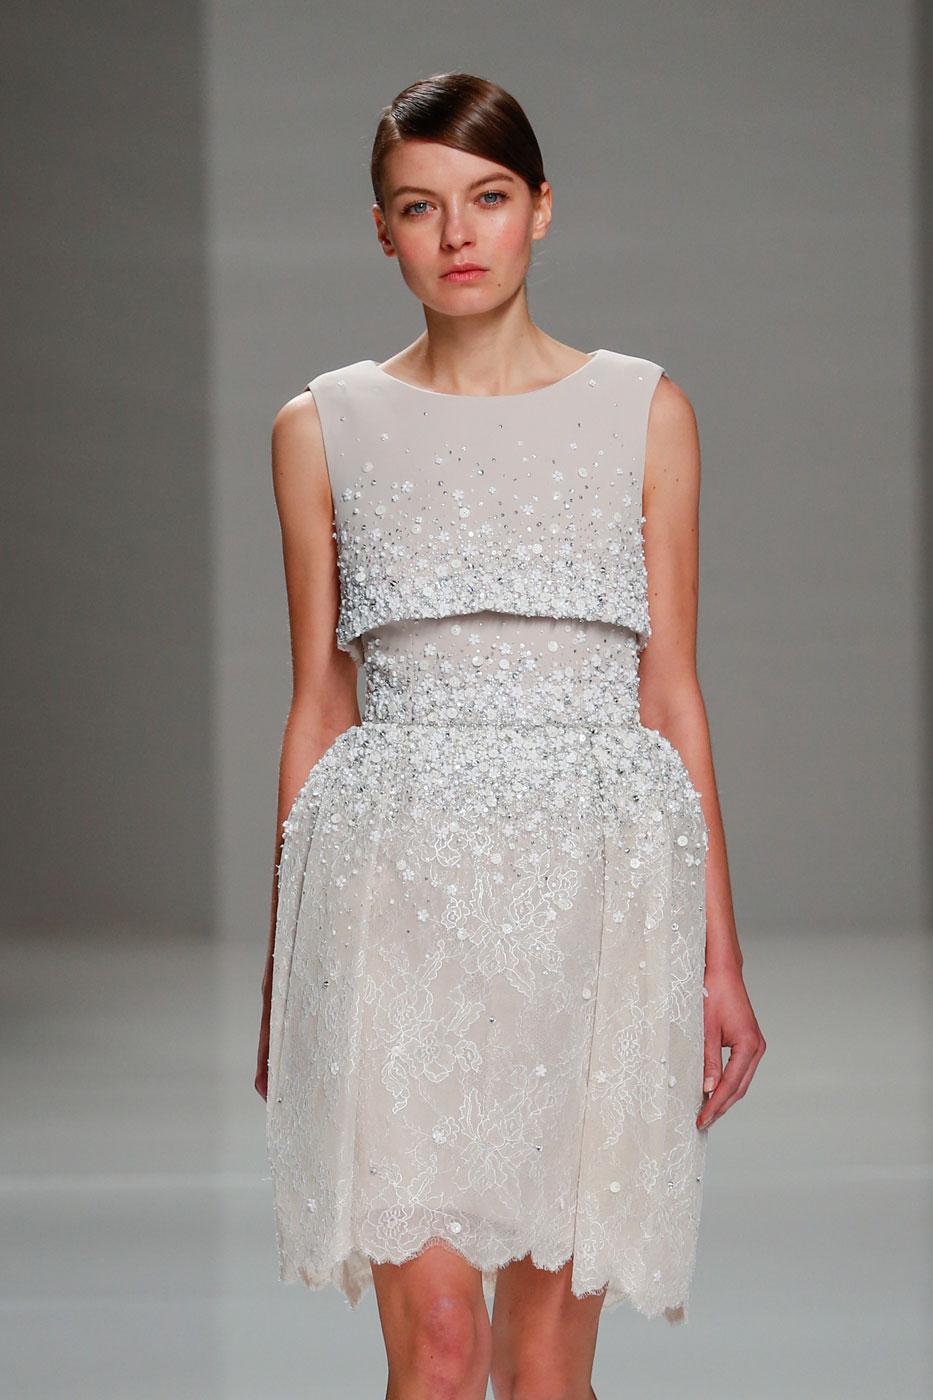 Georges-Hobeika-fashion-runway-show-haute-couture-paris-spring-2015-the-impression-68